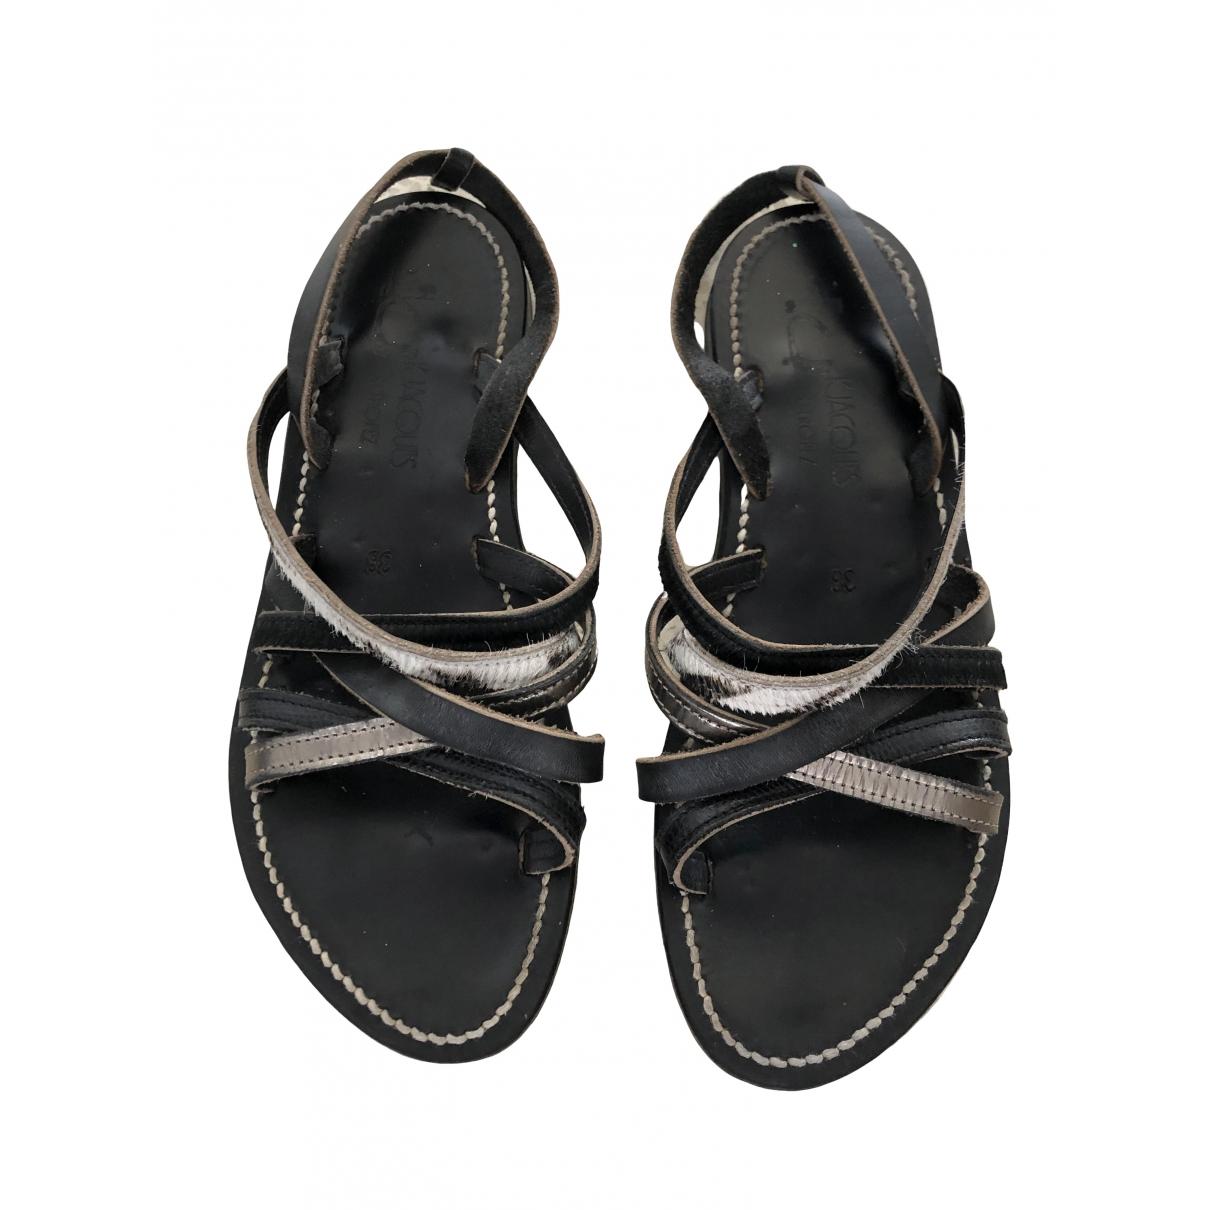 K Jacques \N Black Leather Sandals for Women 38 EU